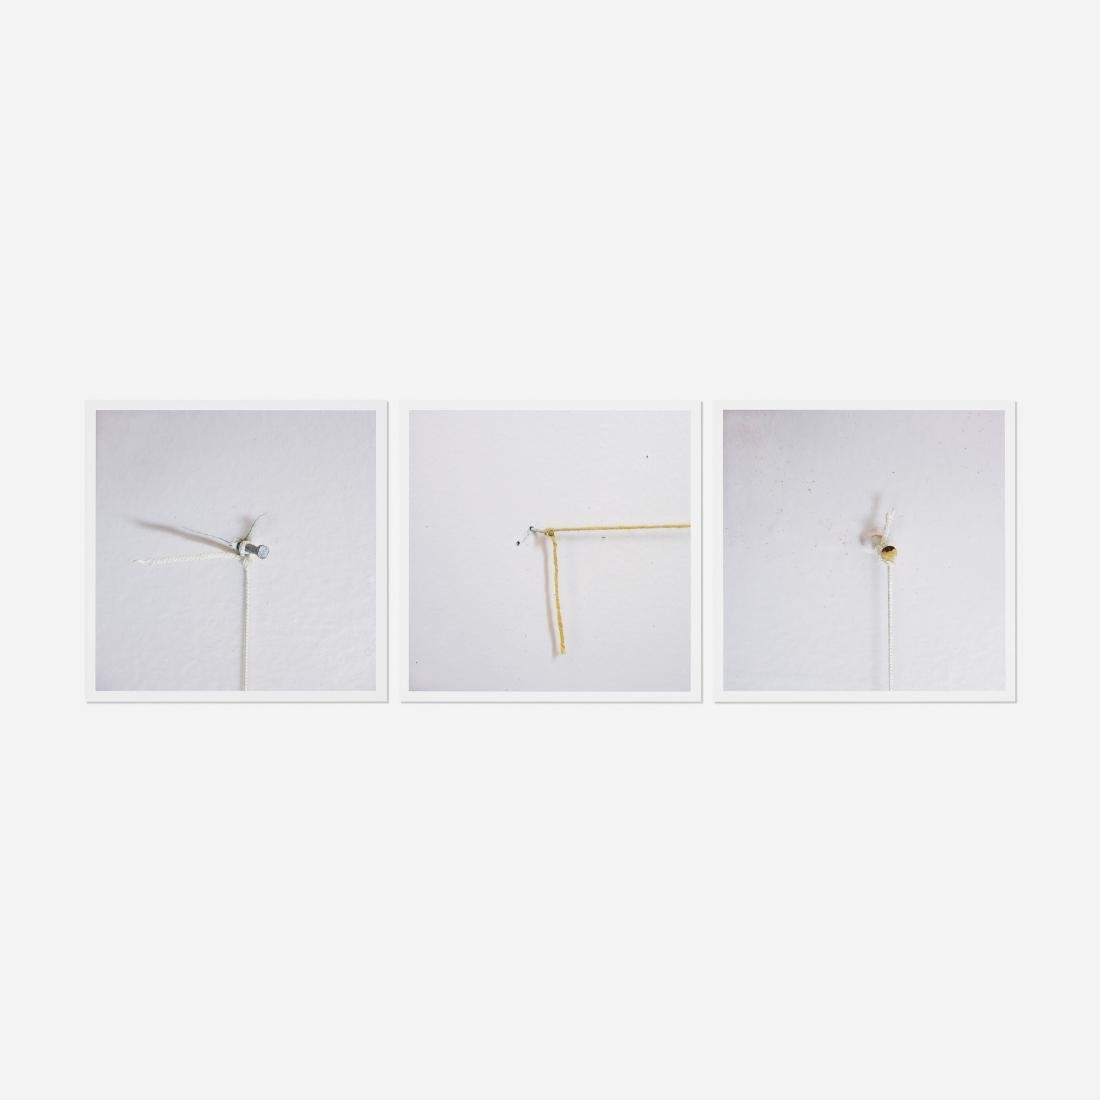 Michael Tweed, Untitled (three works)